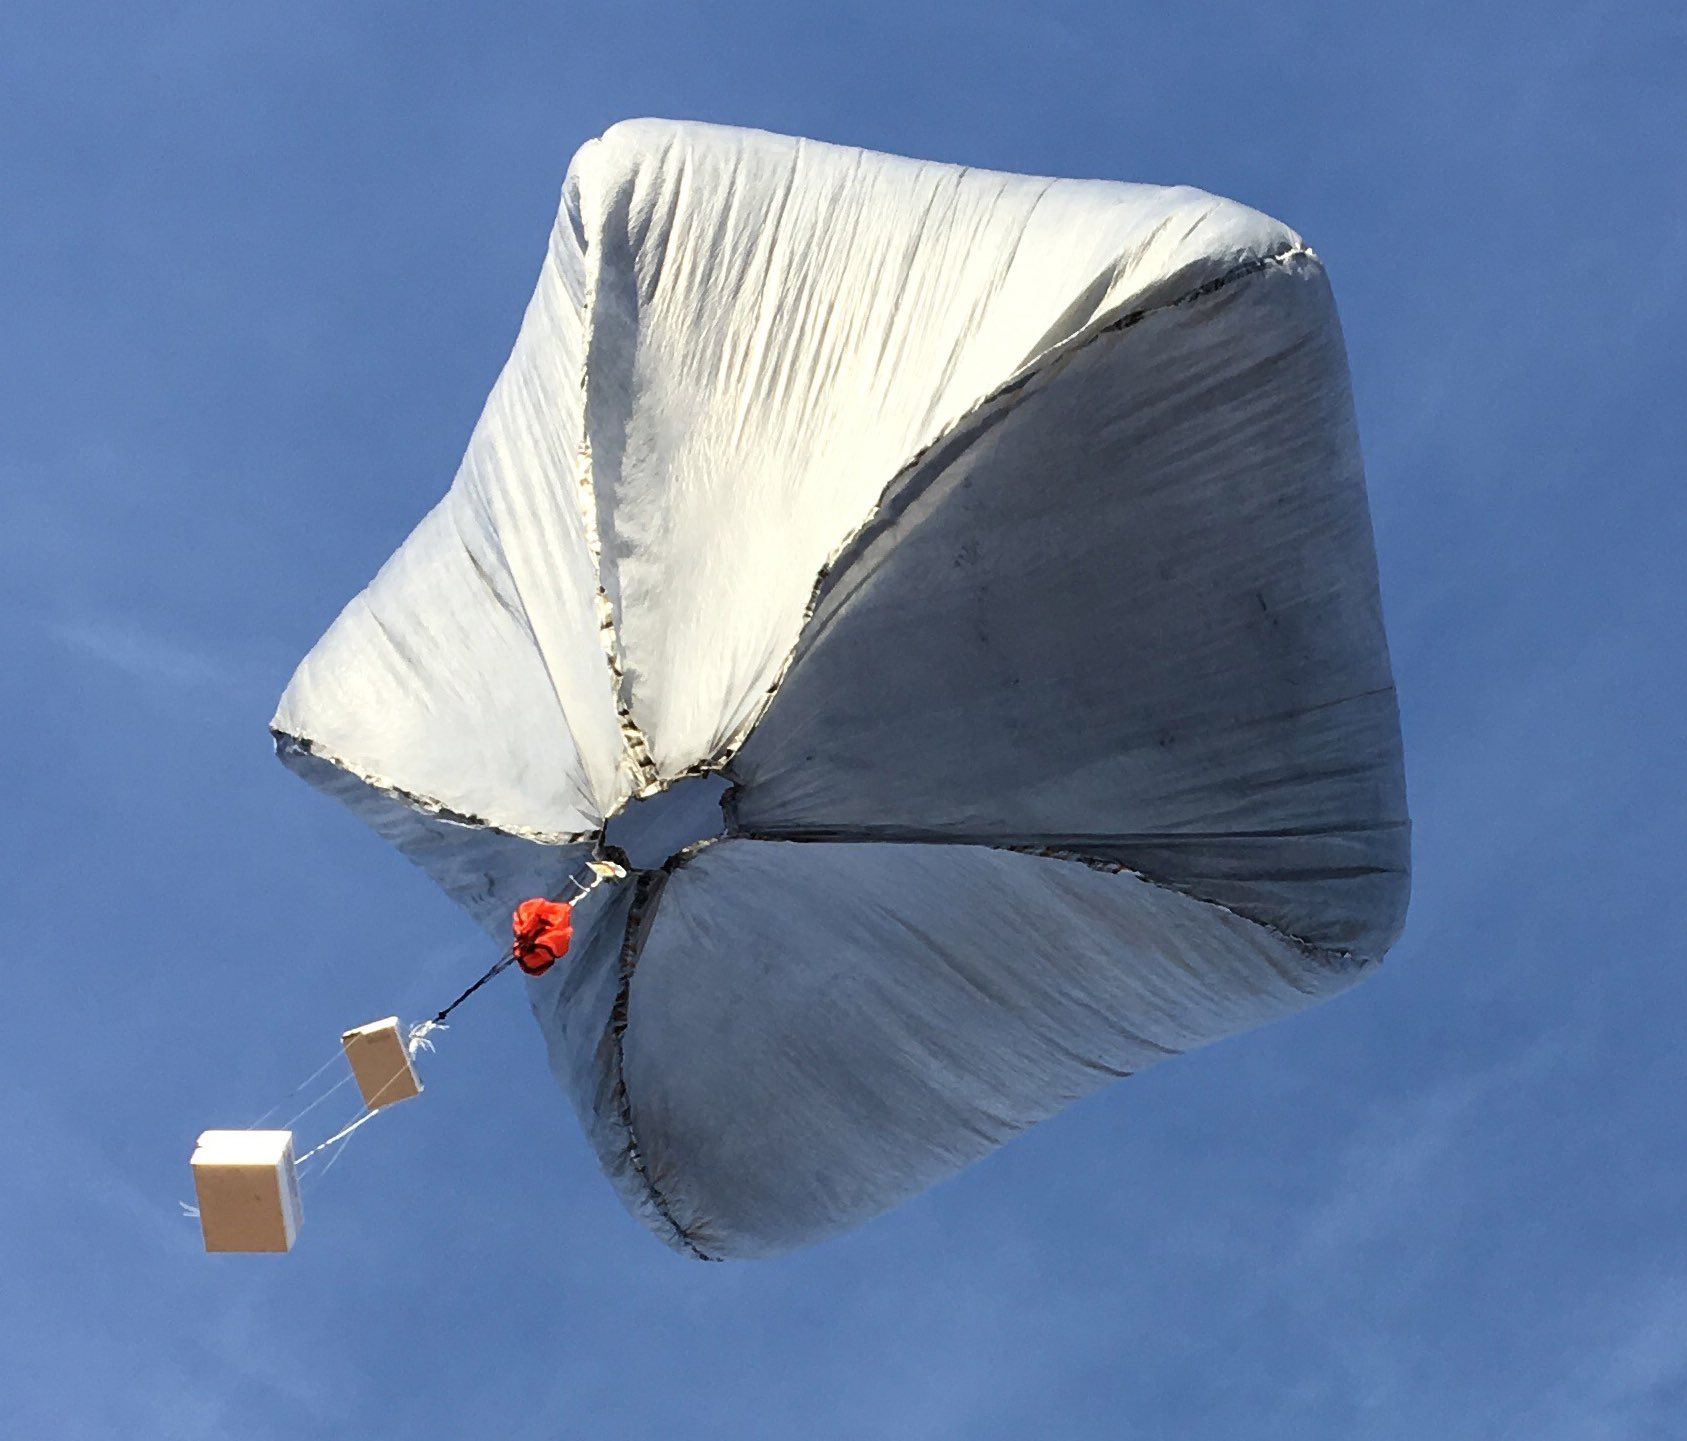 Danny Bowman's Spherical Solar Balloons